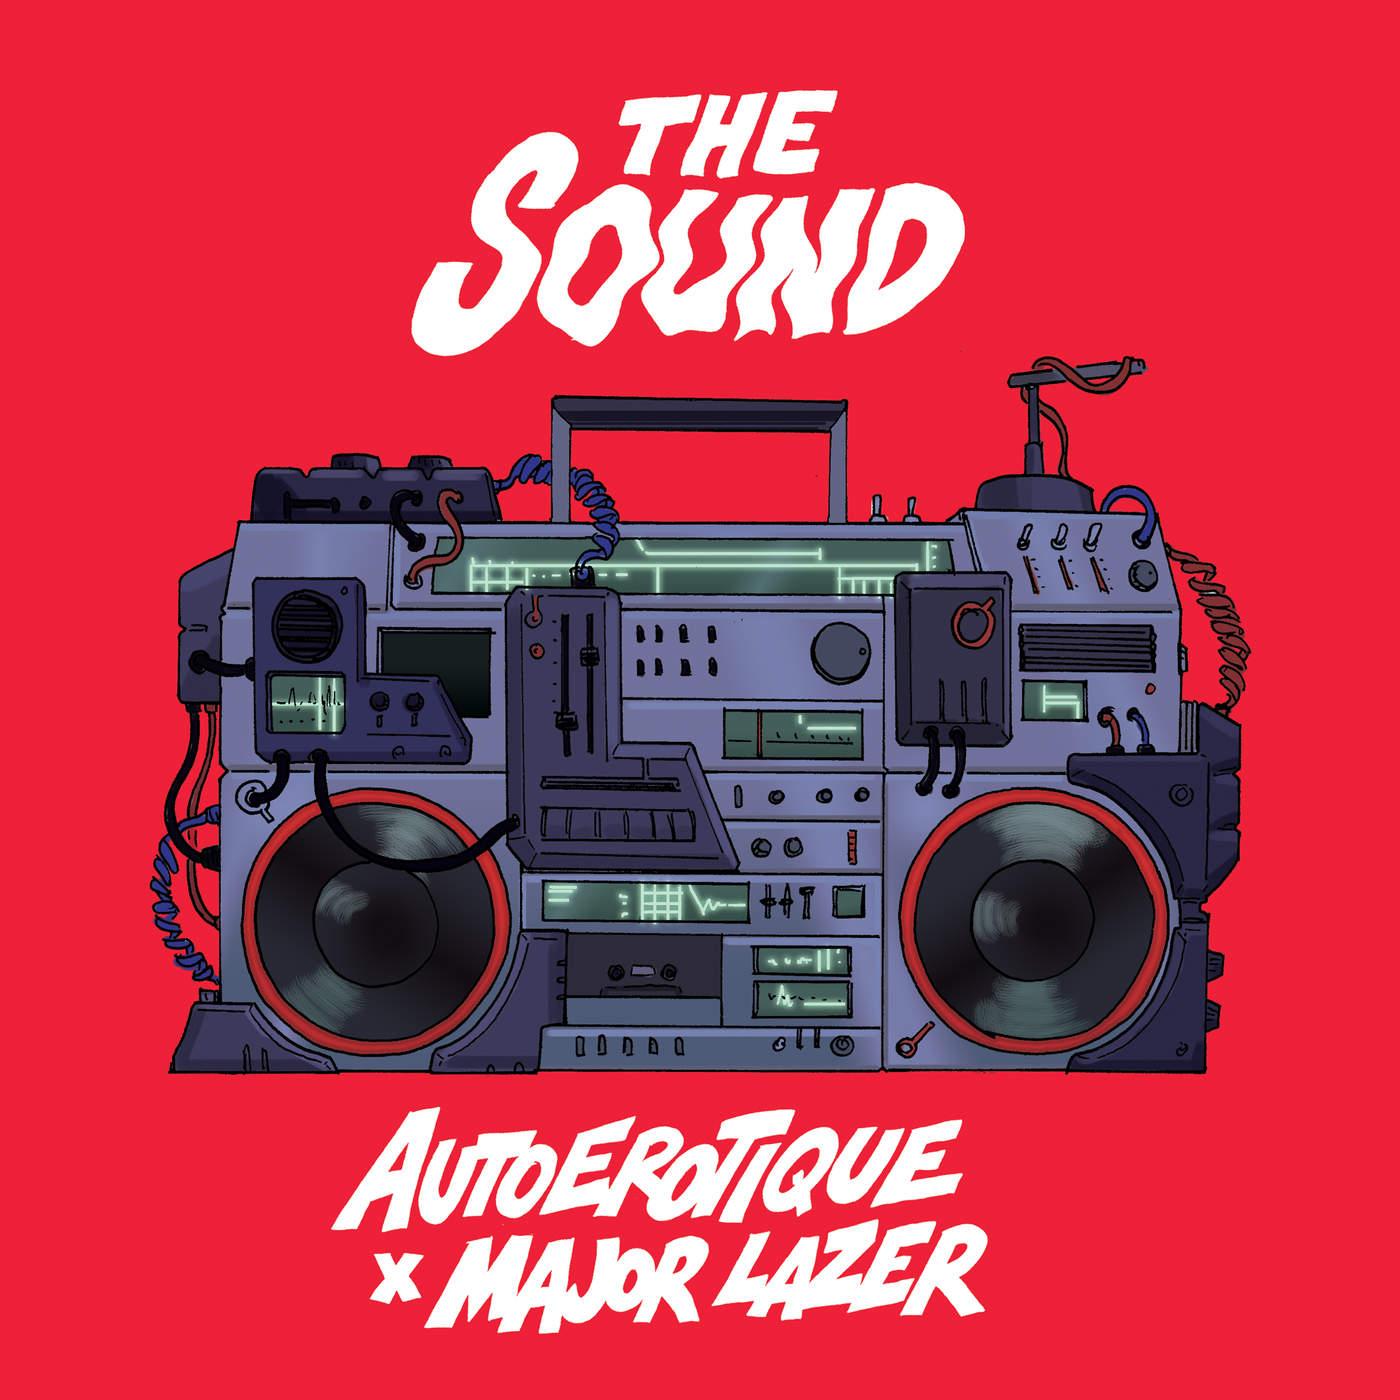 Autoerotique - The Sound (feat. Major Lazer) - Single Cover